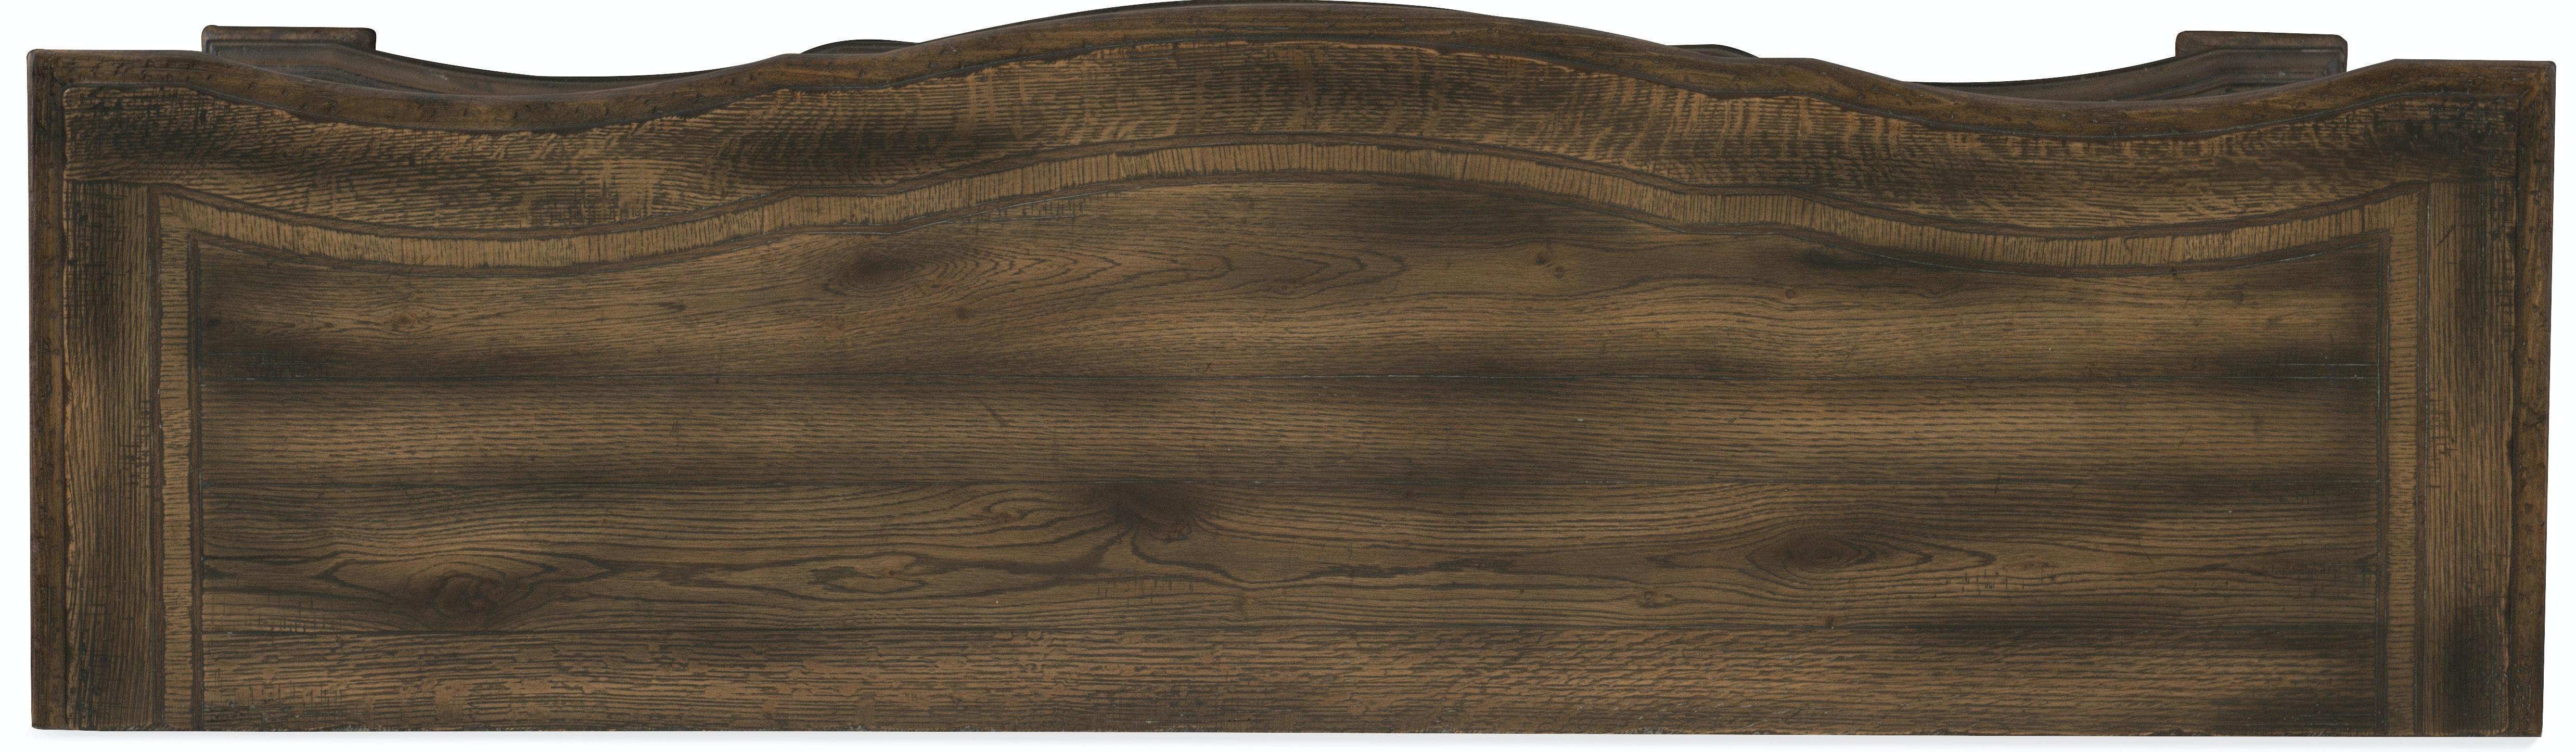 Hooker Furniture Williamson Nine Drawer Dresser 5960 90002 MULTI